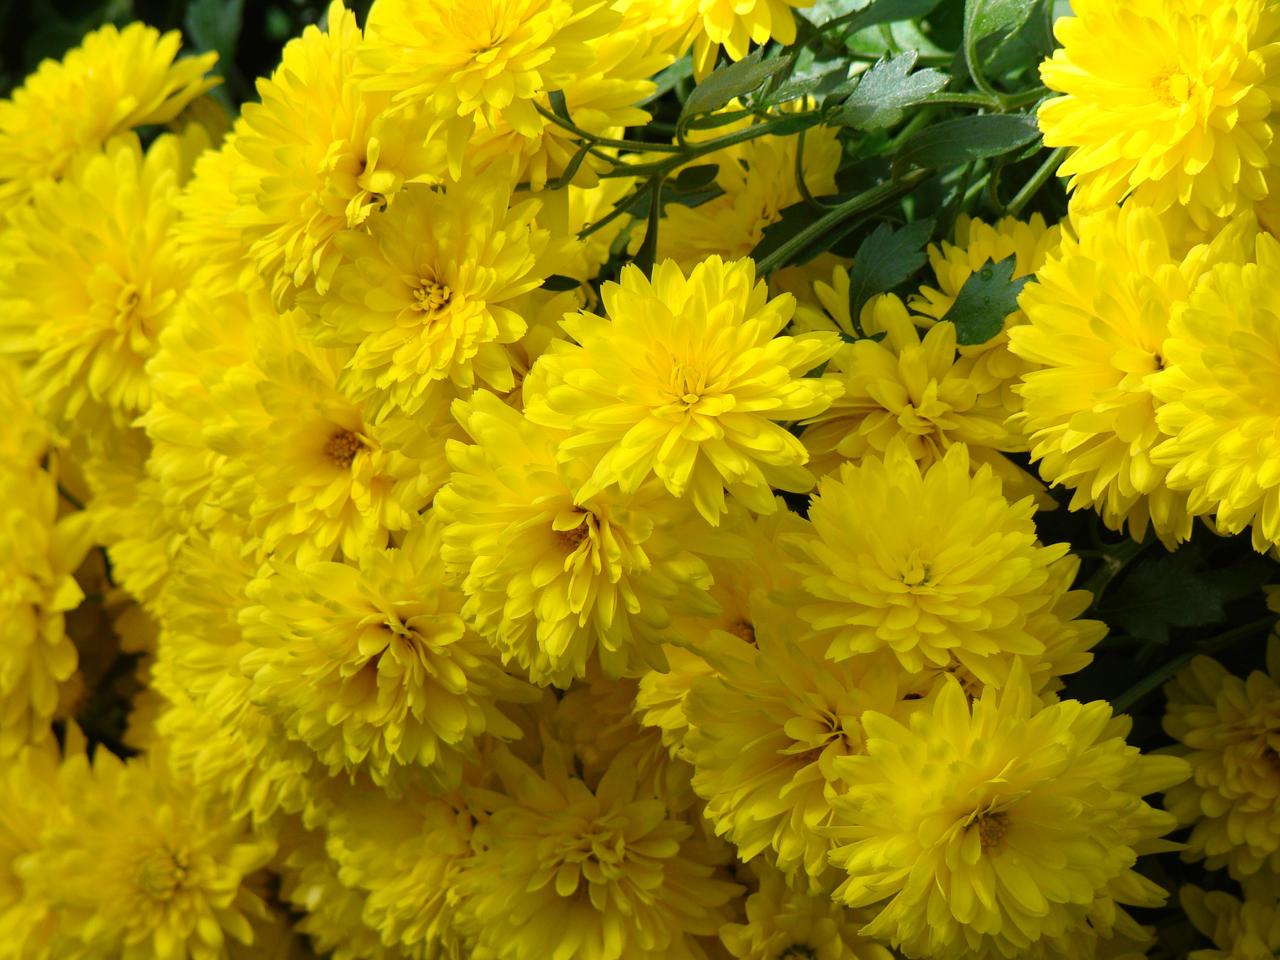 Spring Joy by lcshaver06